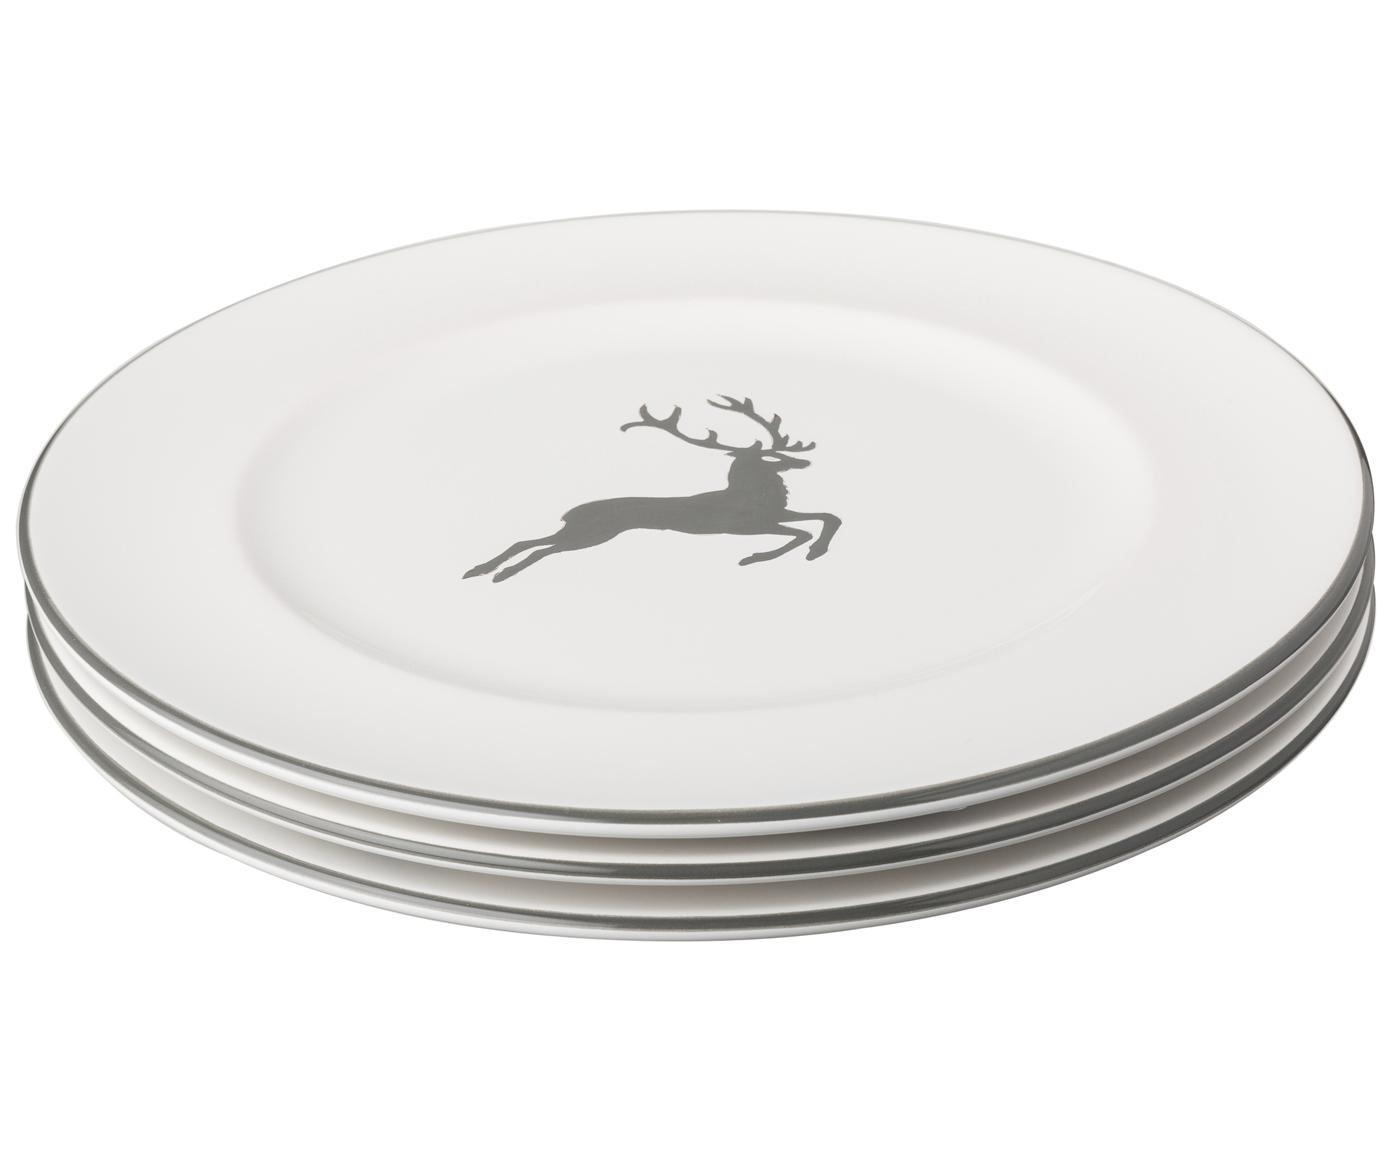 Dinerbord Gourmet Grijze Hert, Keramiek, Grijs, wit, Ø 27 cm